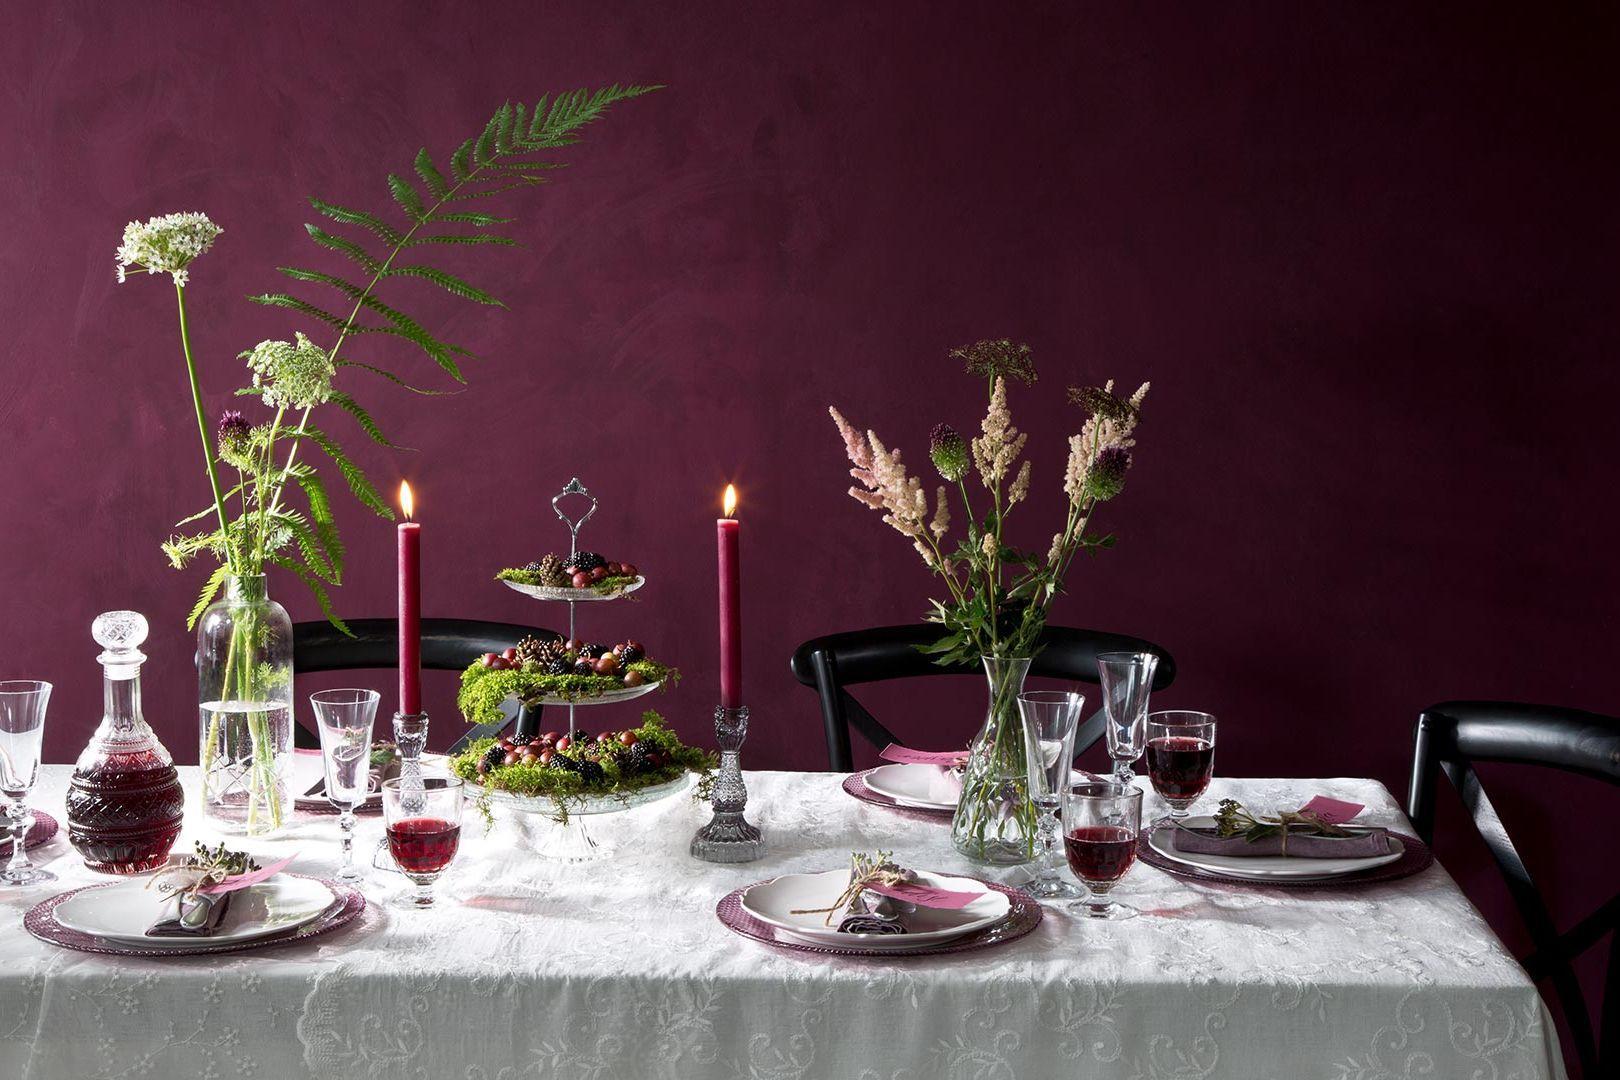 Sprookjesachtig tafelen